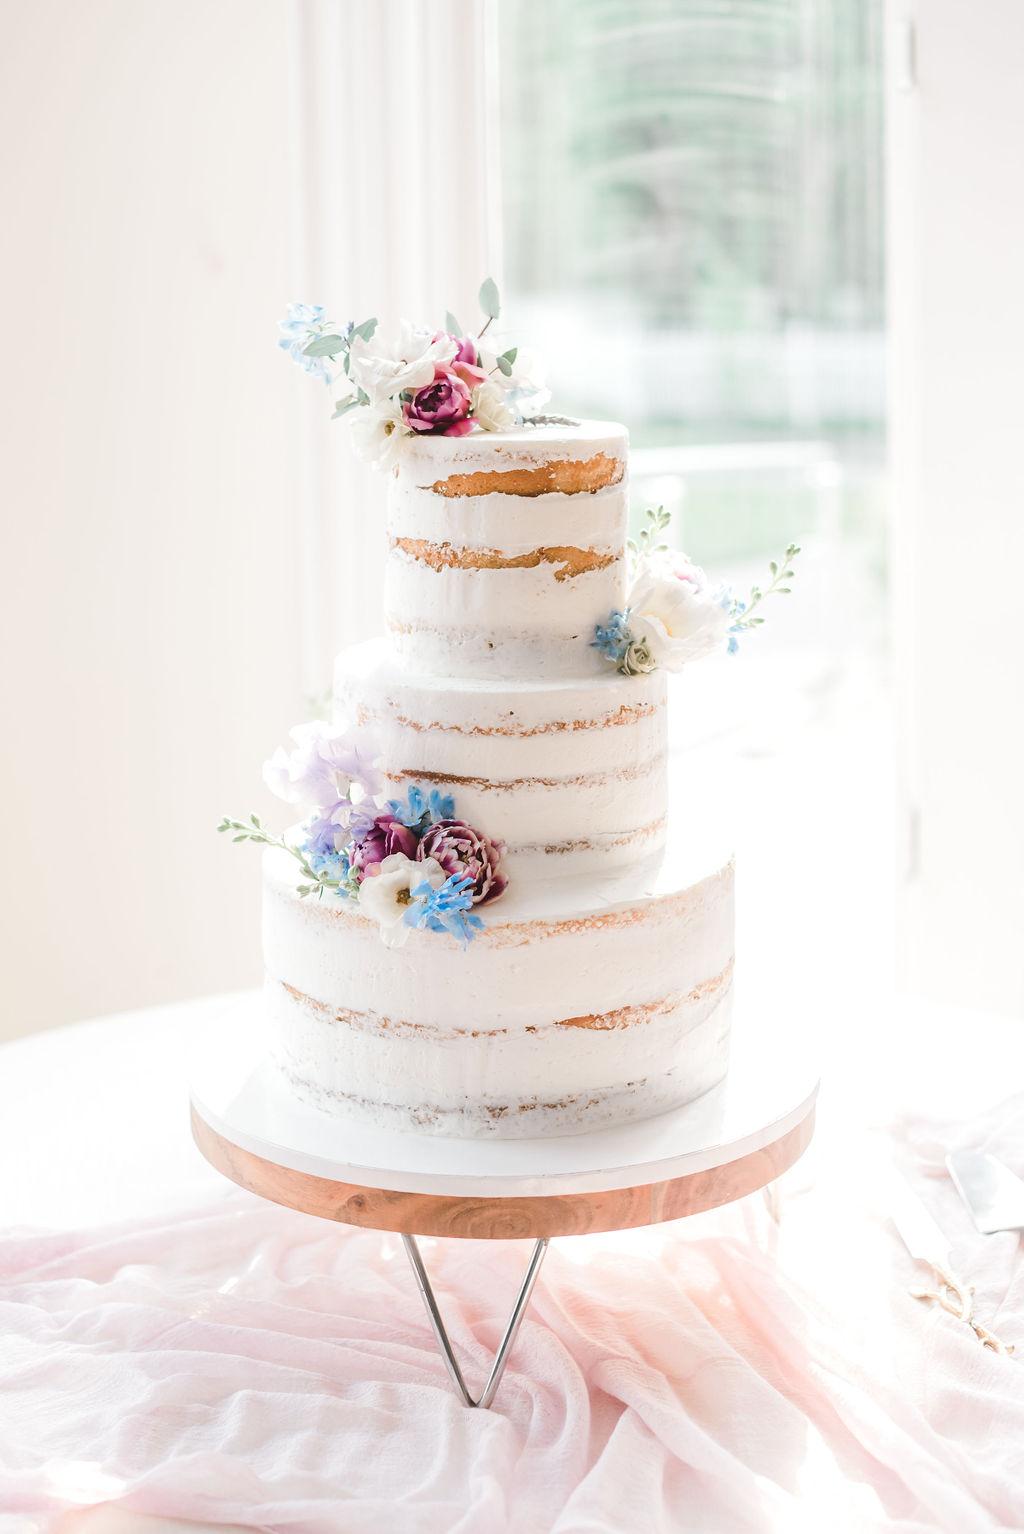 Dayton-event-planner-wedding-cake-floral